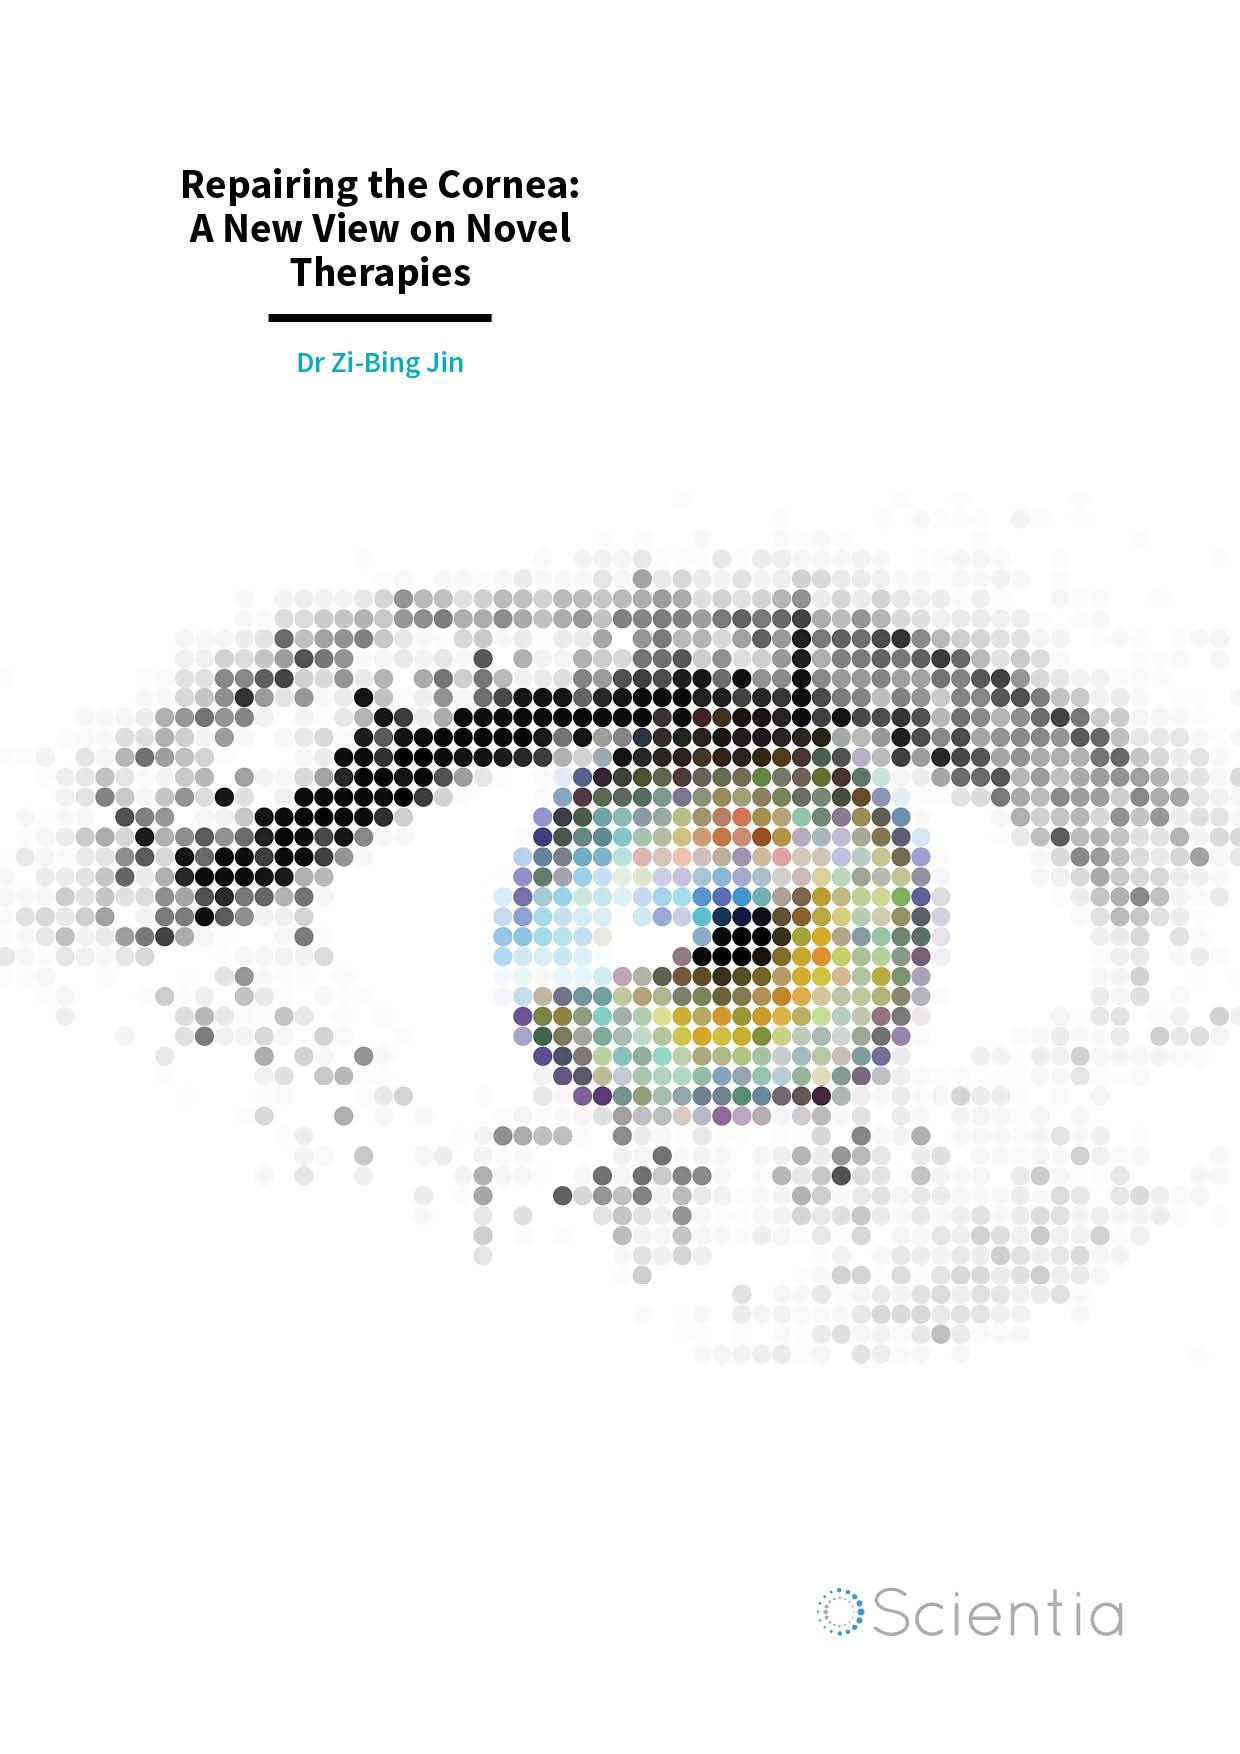 Dr Zi-Bing Jin – Repairing the Cornea: A New View on Novel Therapies